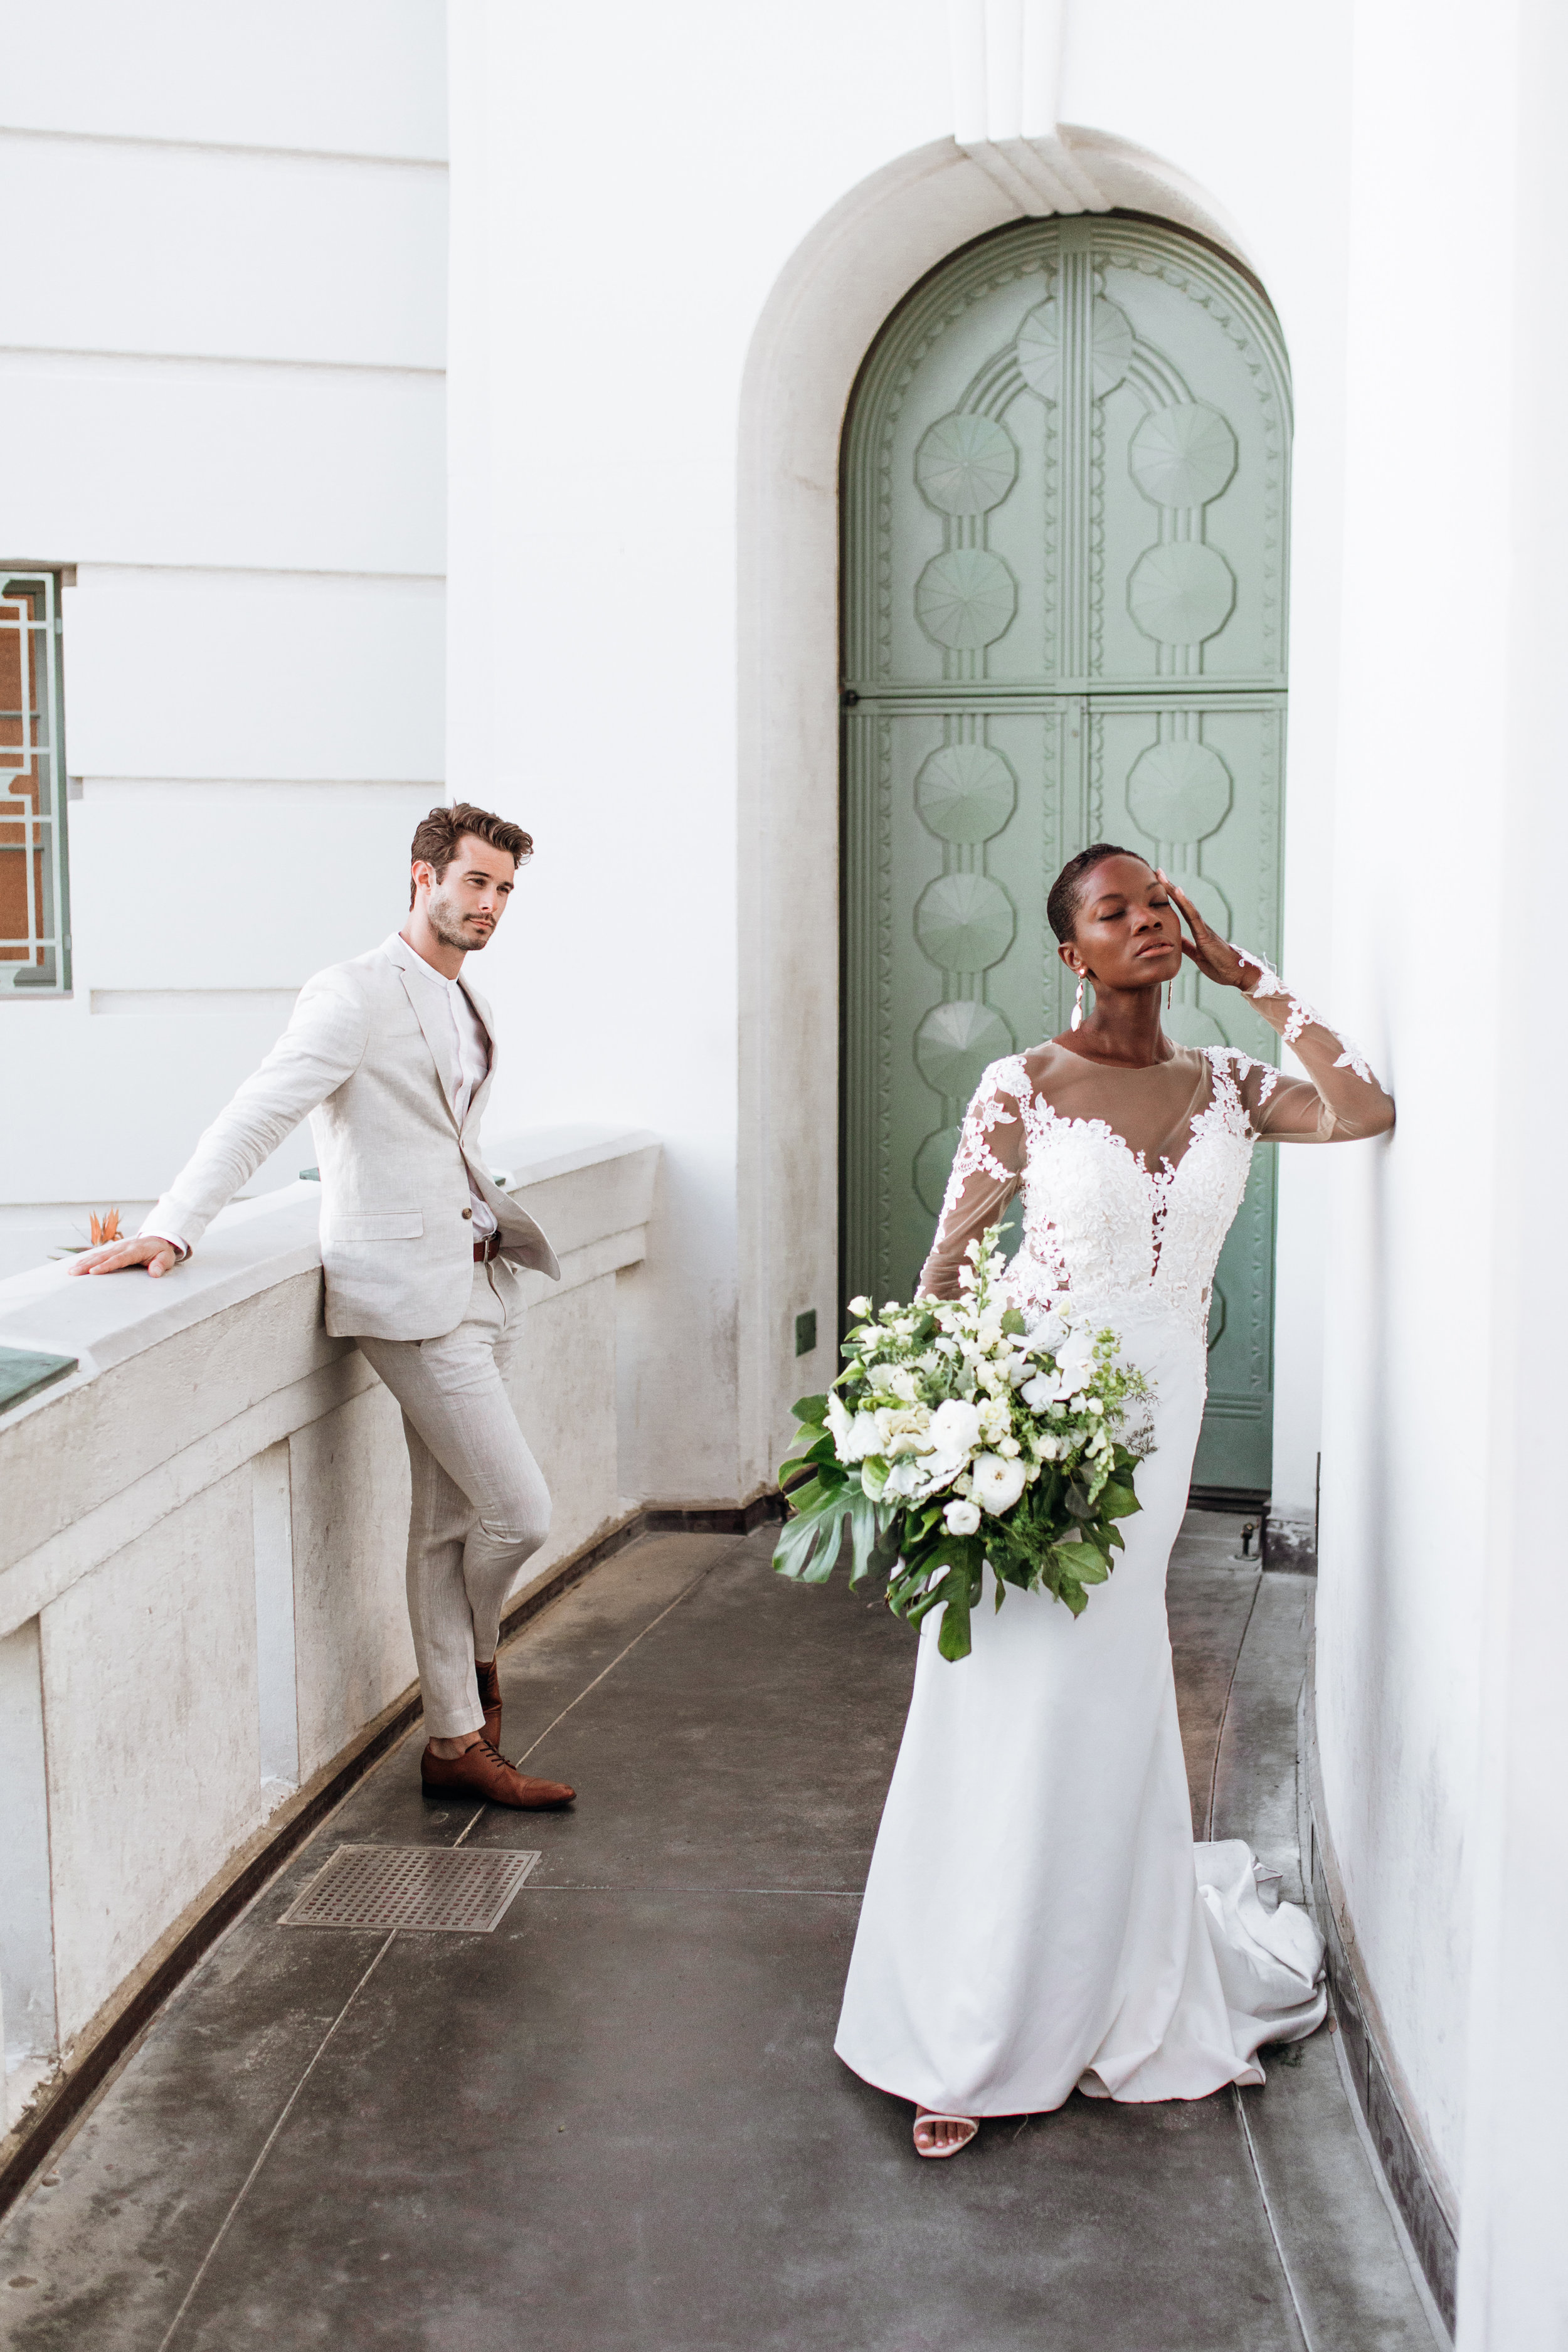 los-angeles-california-griffith-observatory-wedding-bridal-photography-michael-cozzens-115.jpg